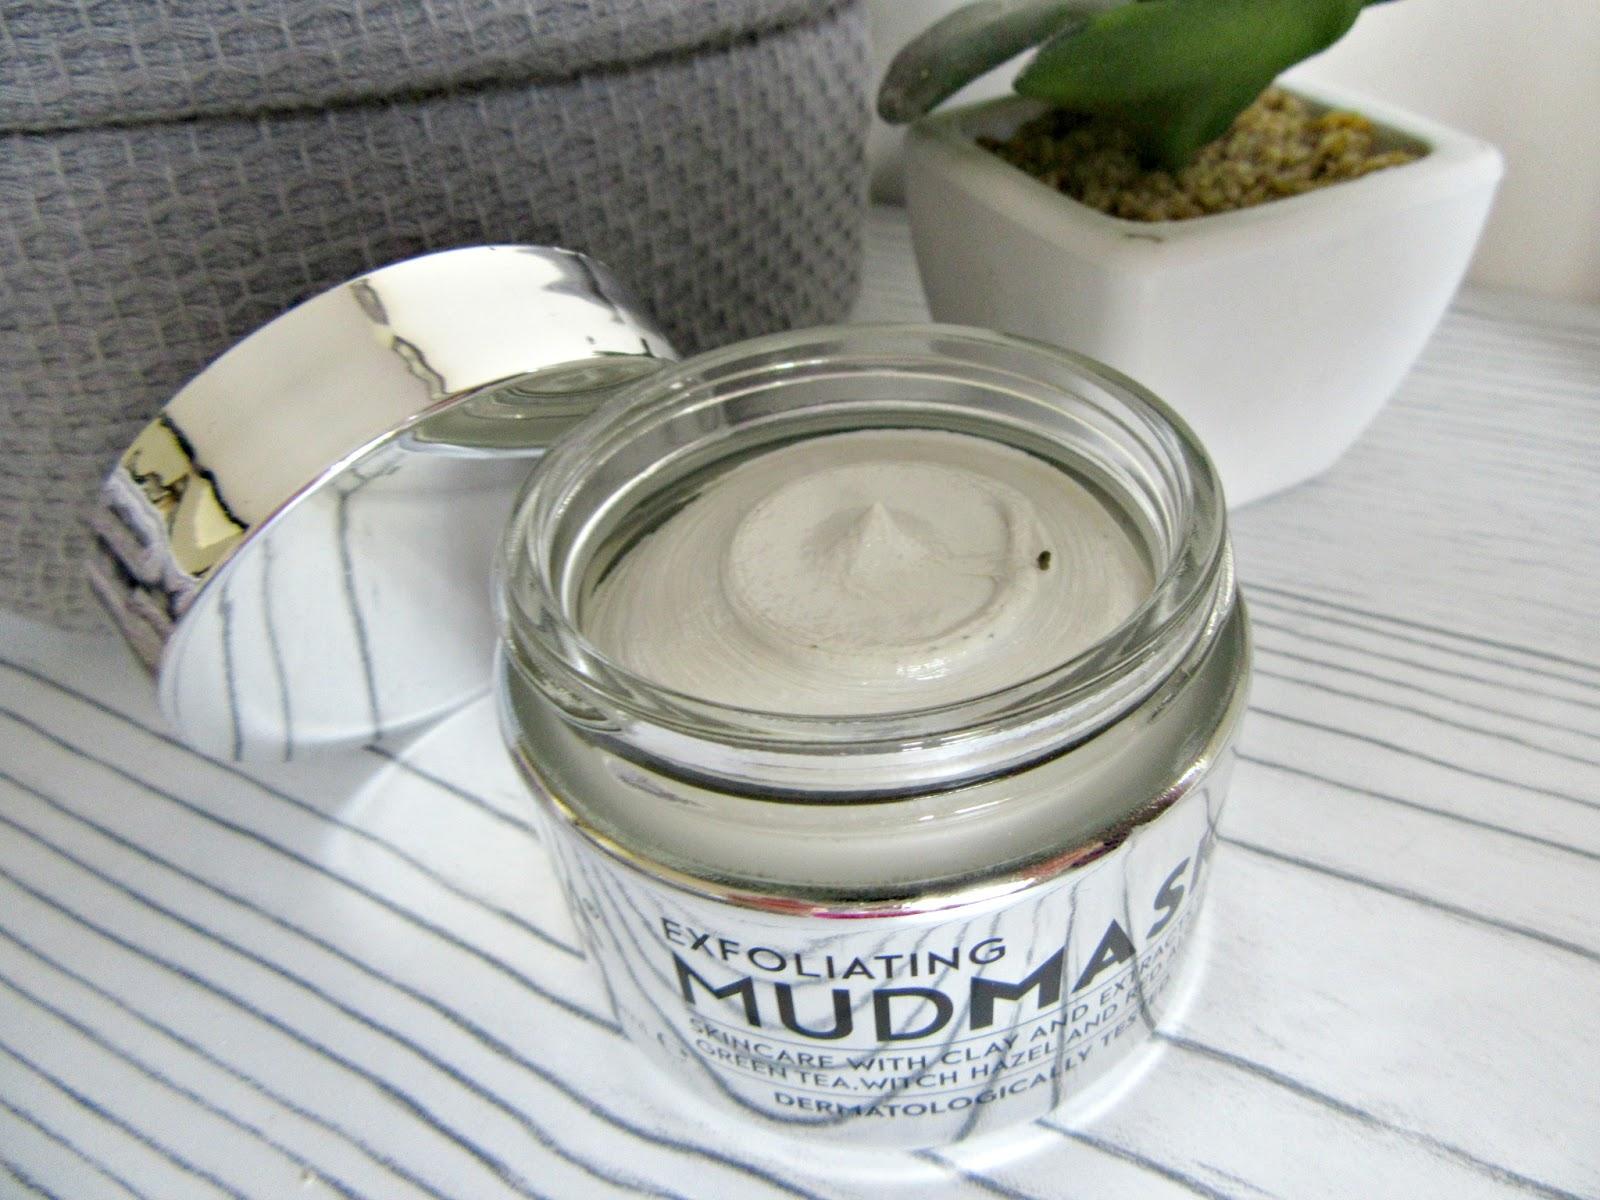 Aldi Lacura Exfoliating Face Mask